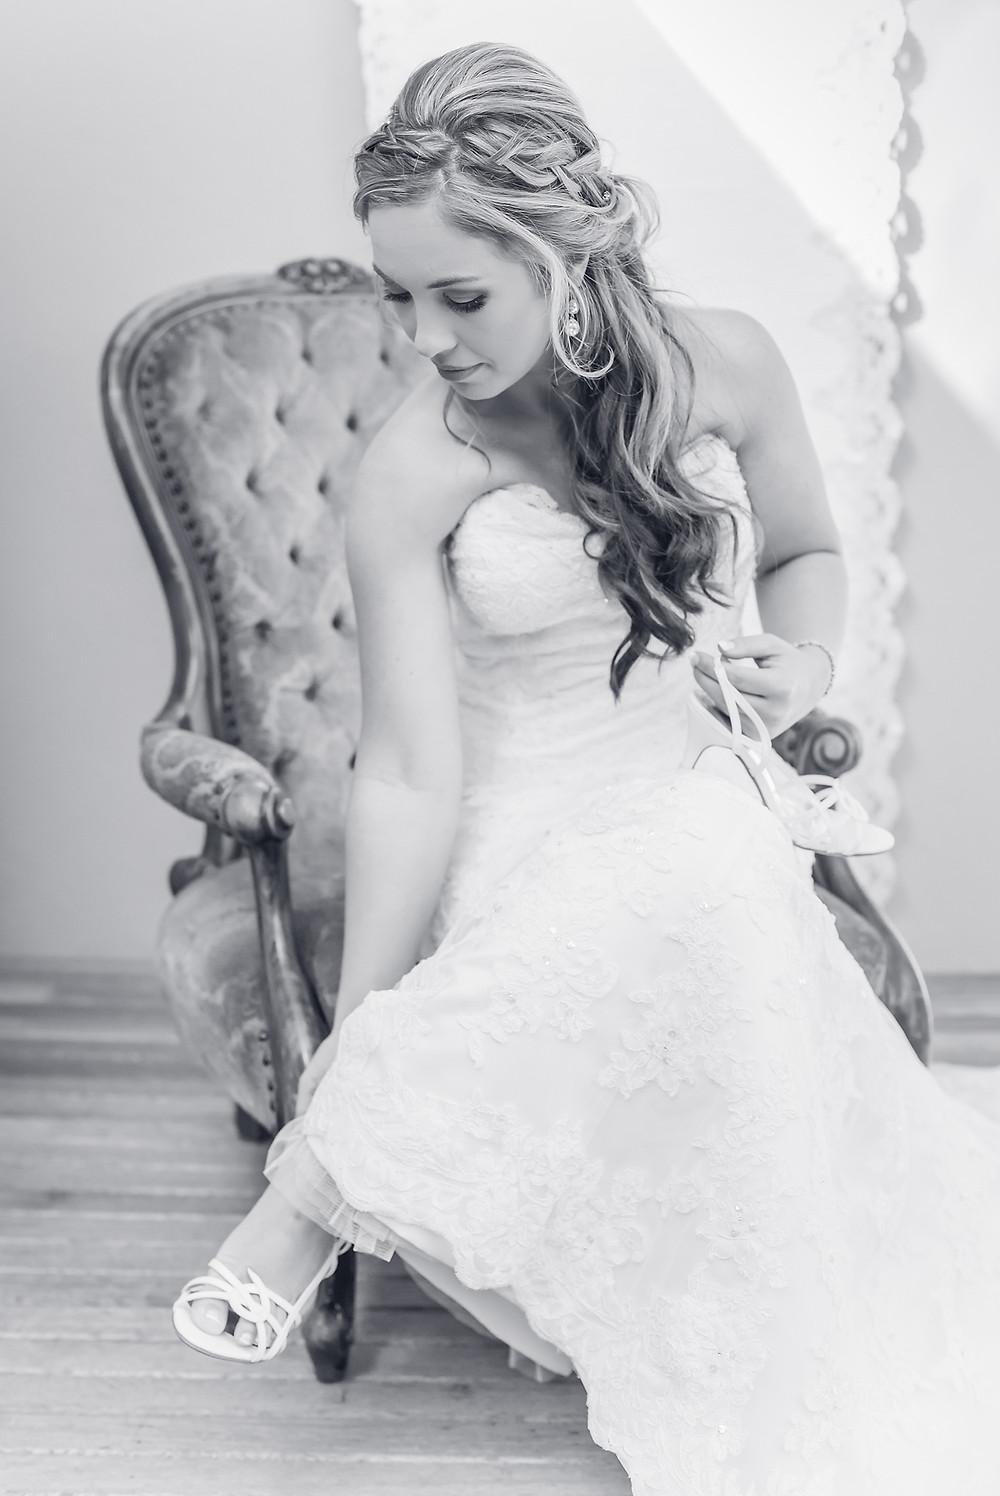 Wedding photography, l'Aquila Country Estate, Nicolene Meyer Photography